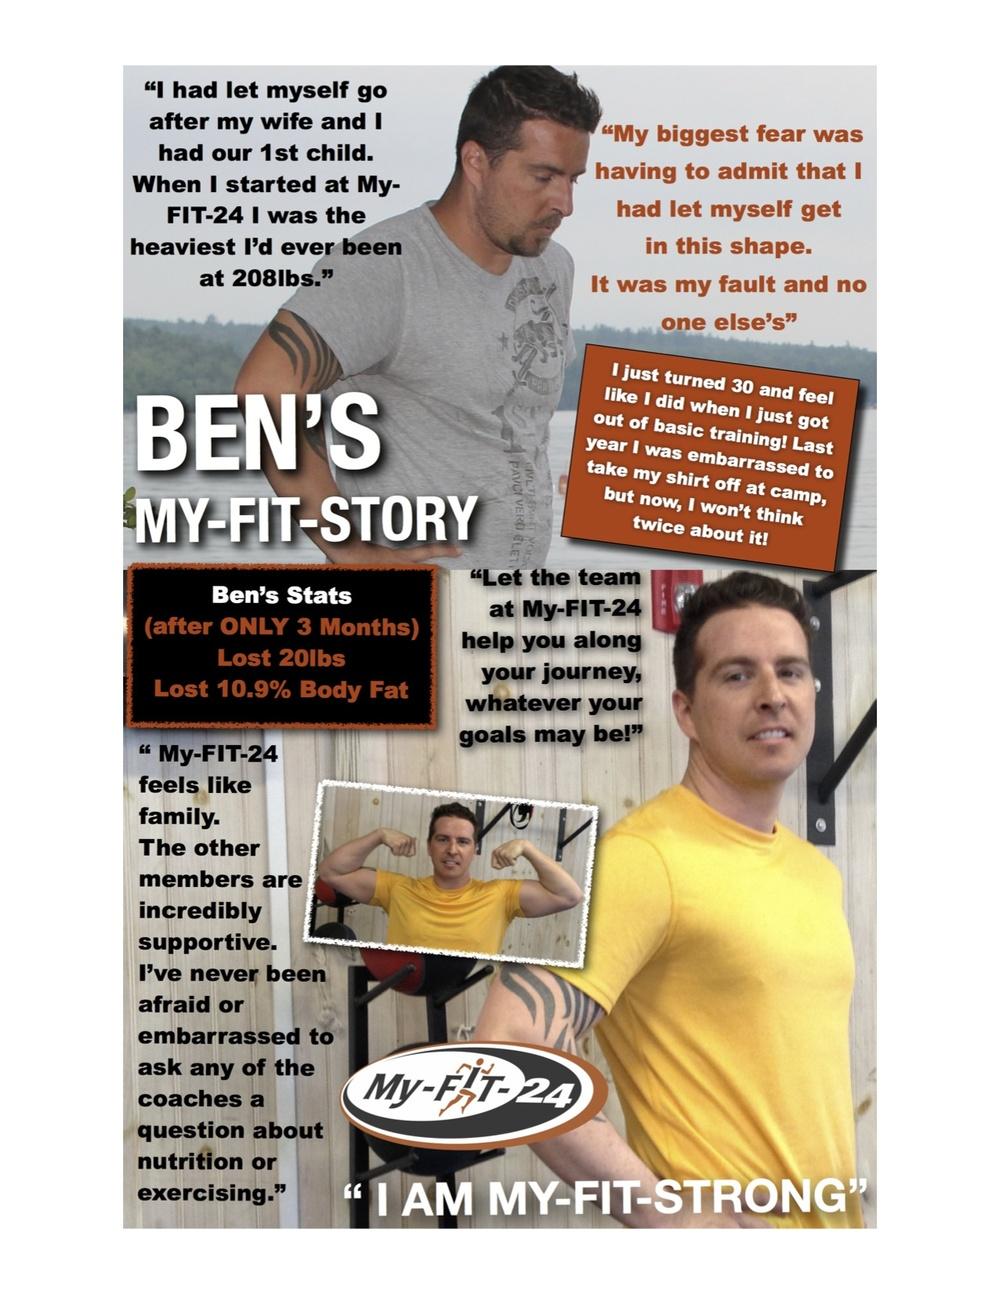 Ben's My-FIT-Story.jpg